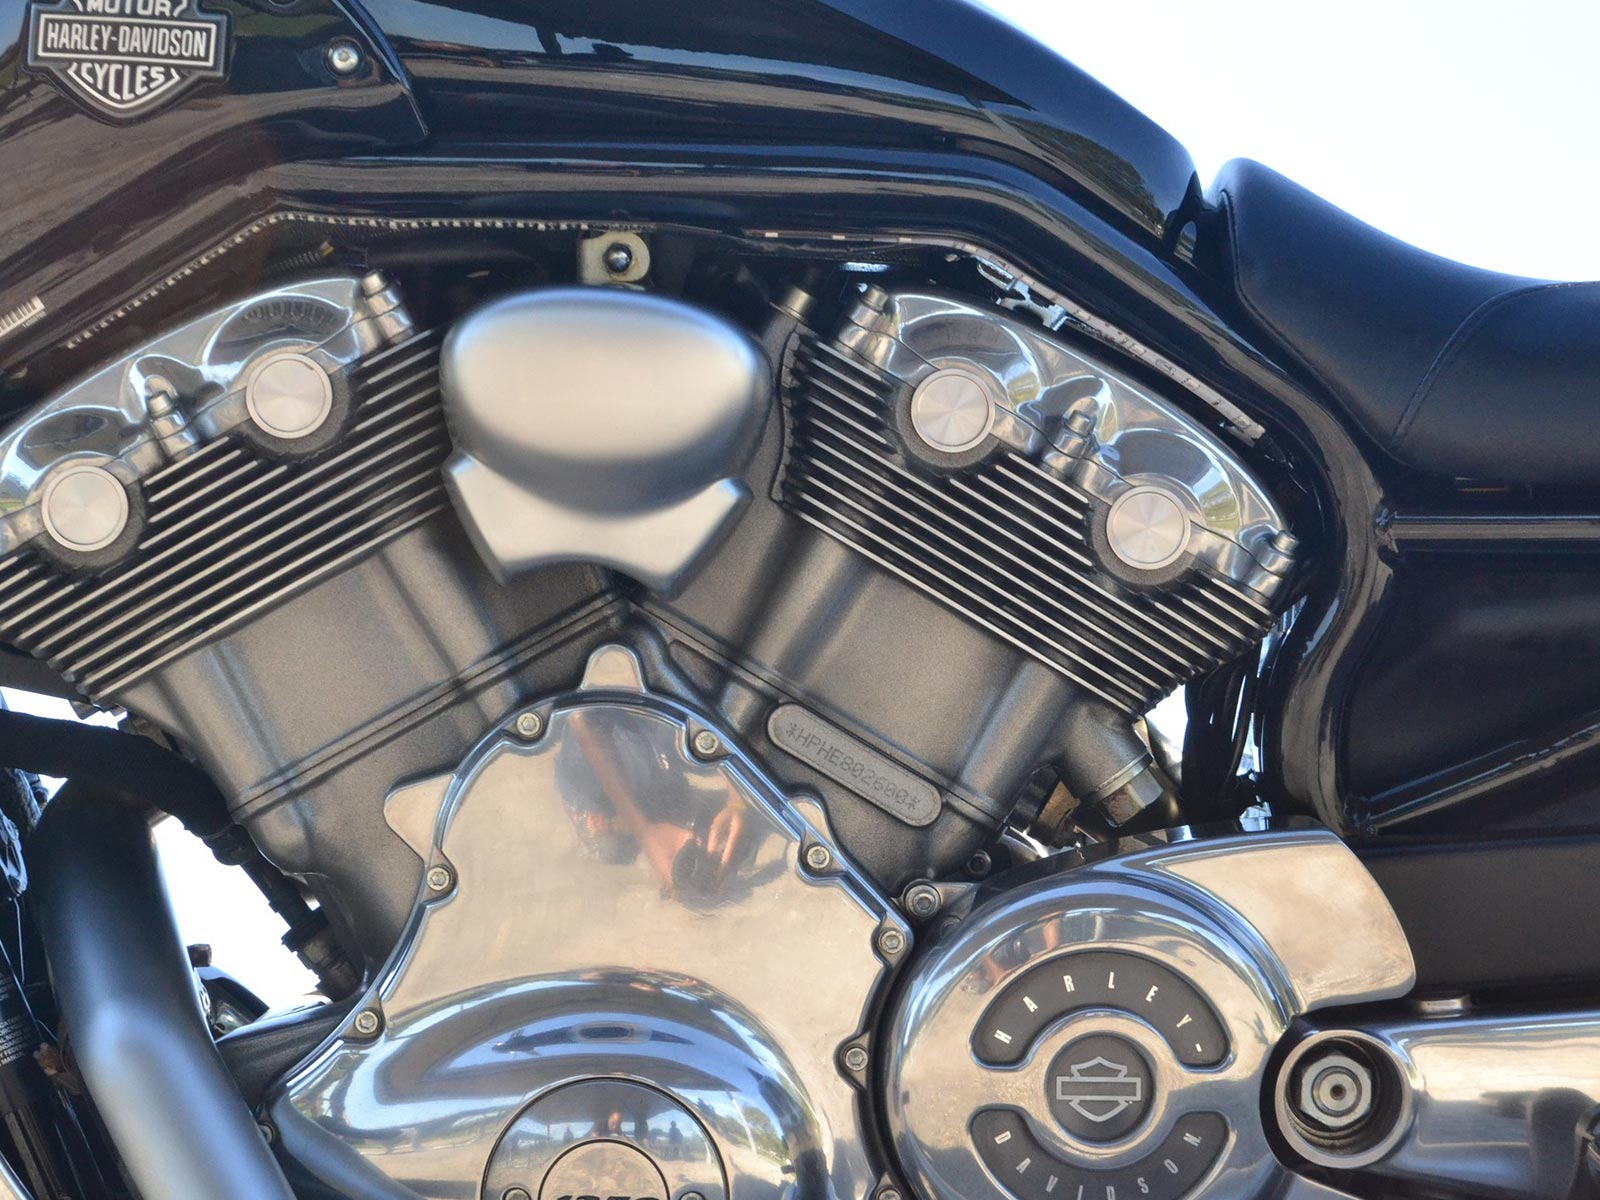 Schutz Motorrad